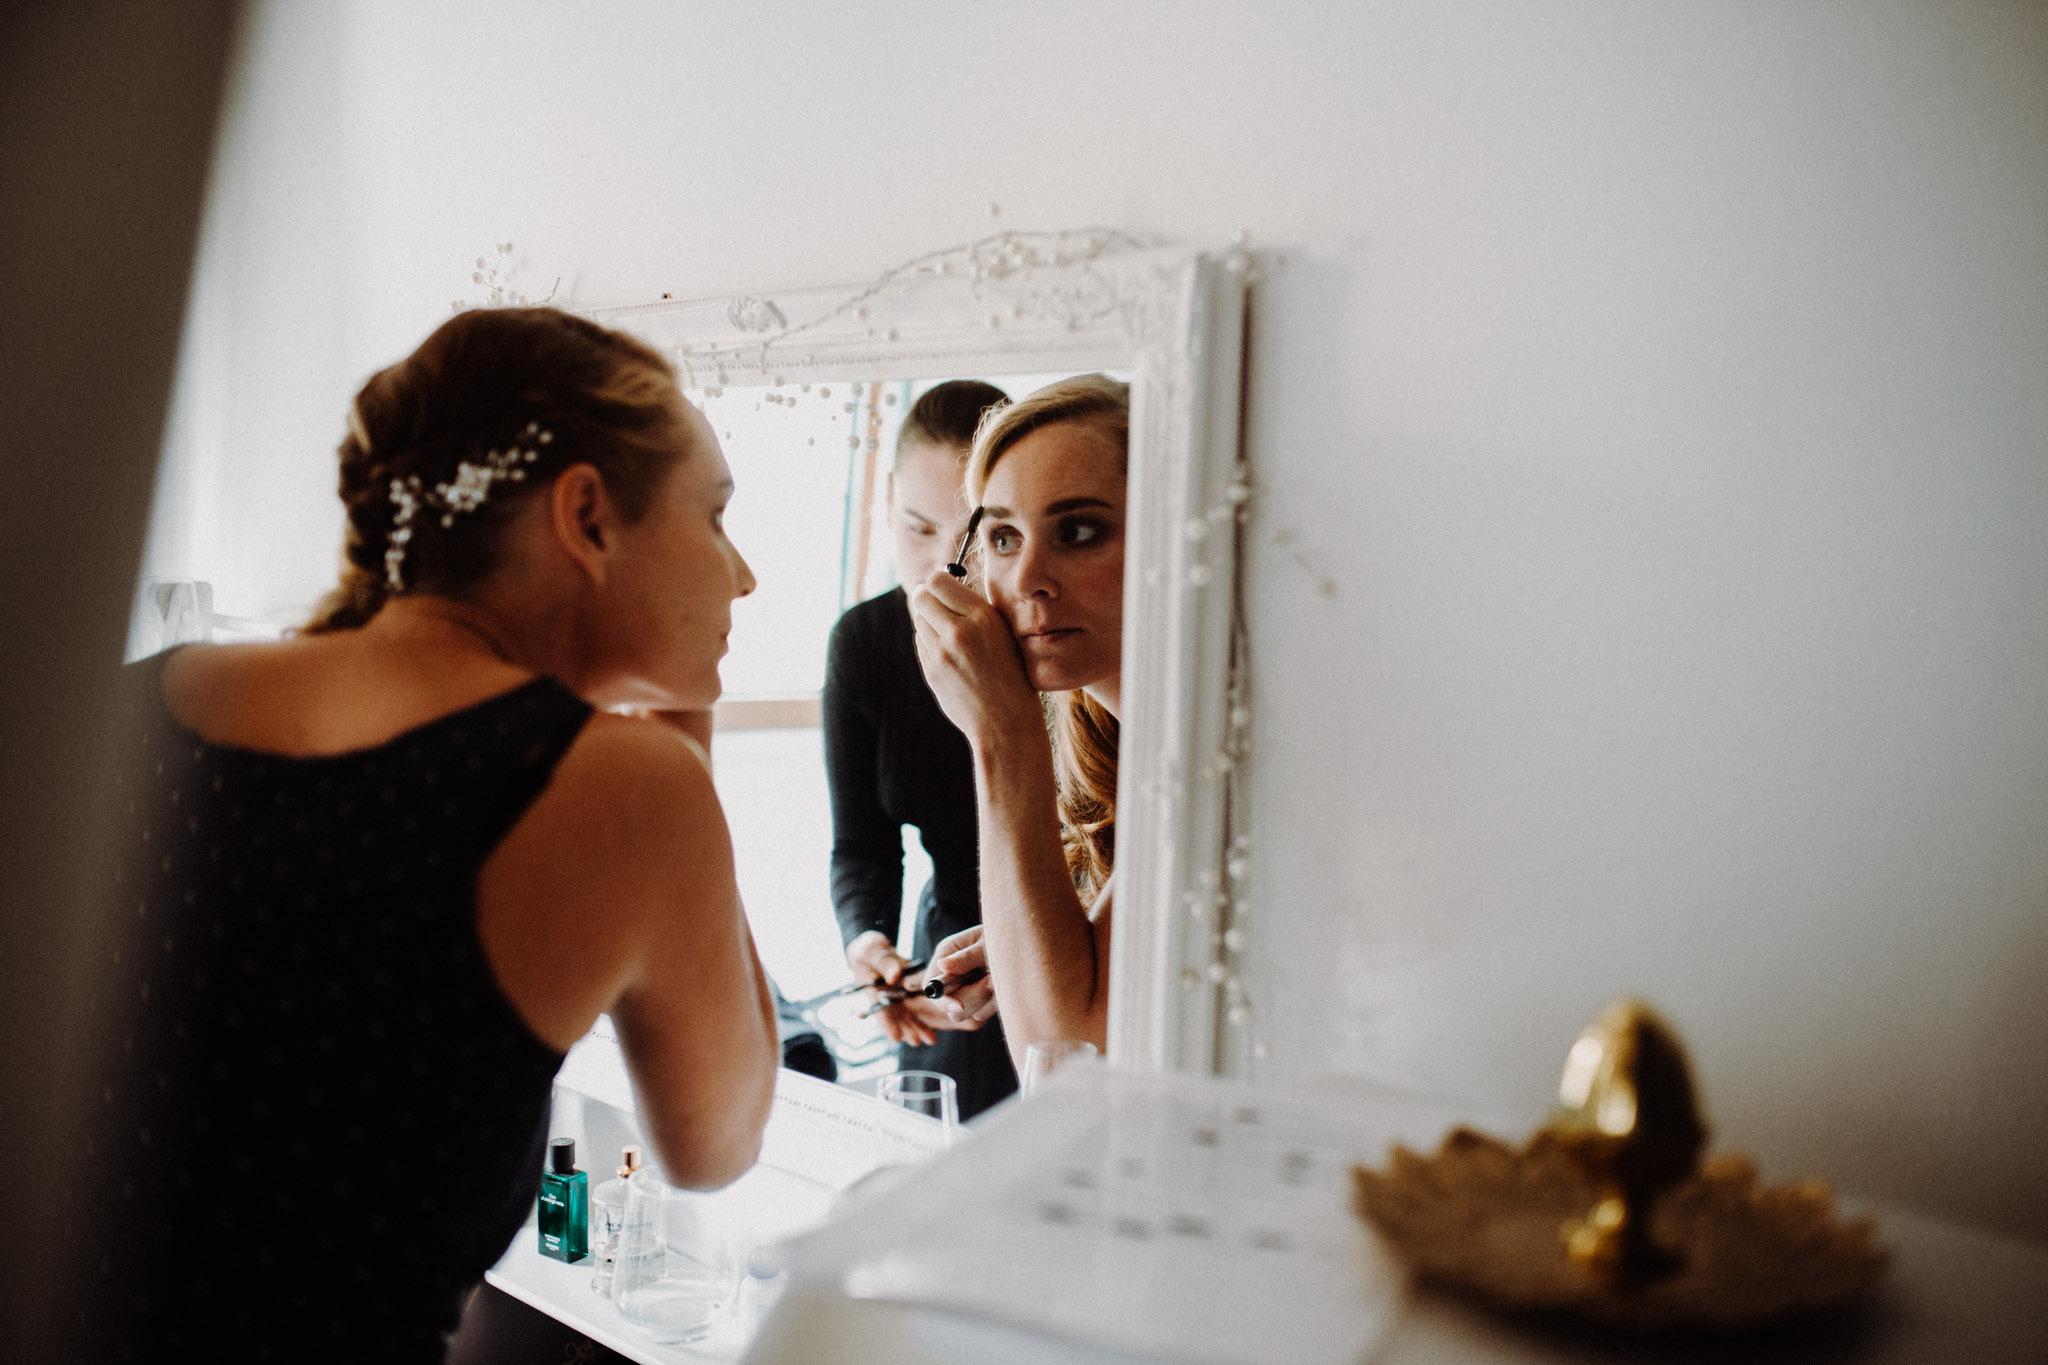 Hochzeit in Erding I Couple I Shooting I Wedding I Hochzeit IThüringen Hochzeitsfotografie I Wedding Photography